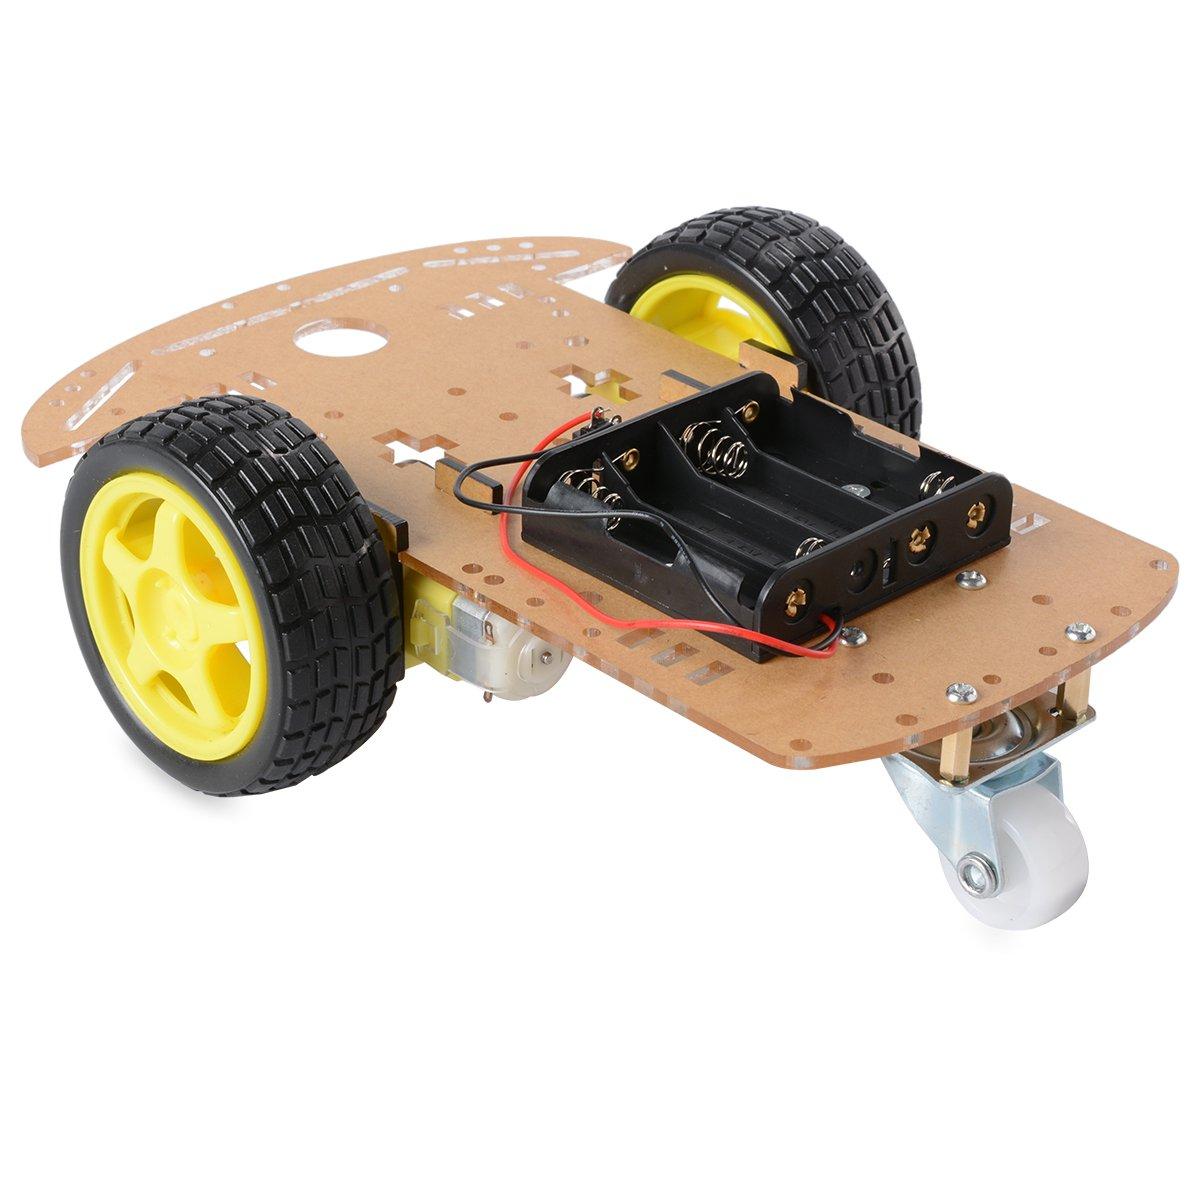 2WD Moteur Smart Robot Car Kit Châ ssis Speed Encoder Boî te de batterie pour Arduino 1:48 ShenZhen Shengxindeyuan Technology Co. Ltd SX024